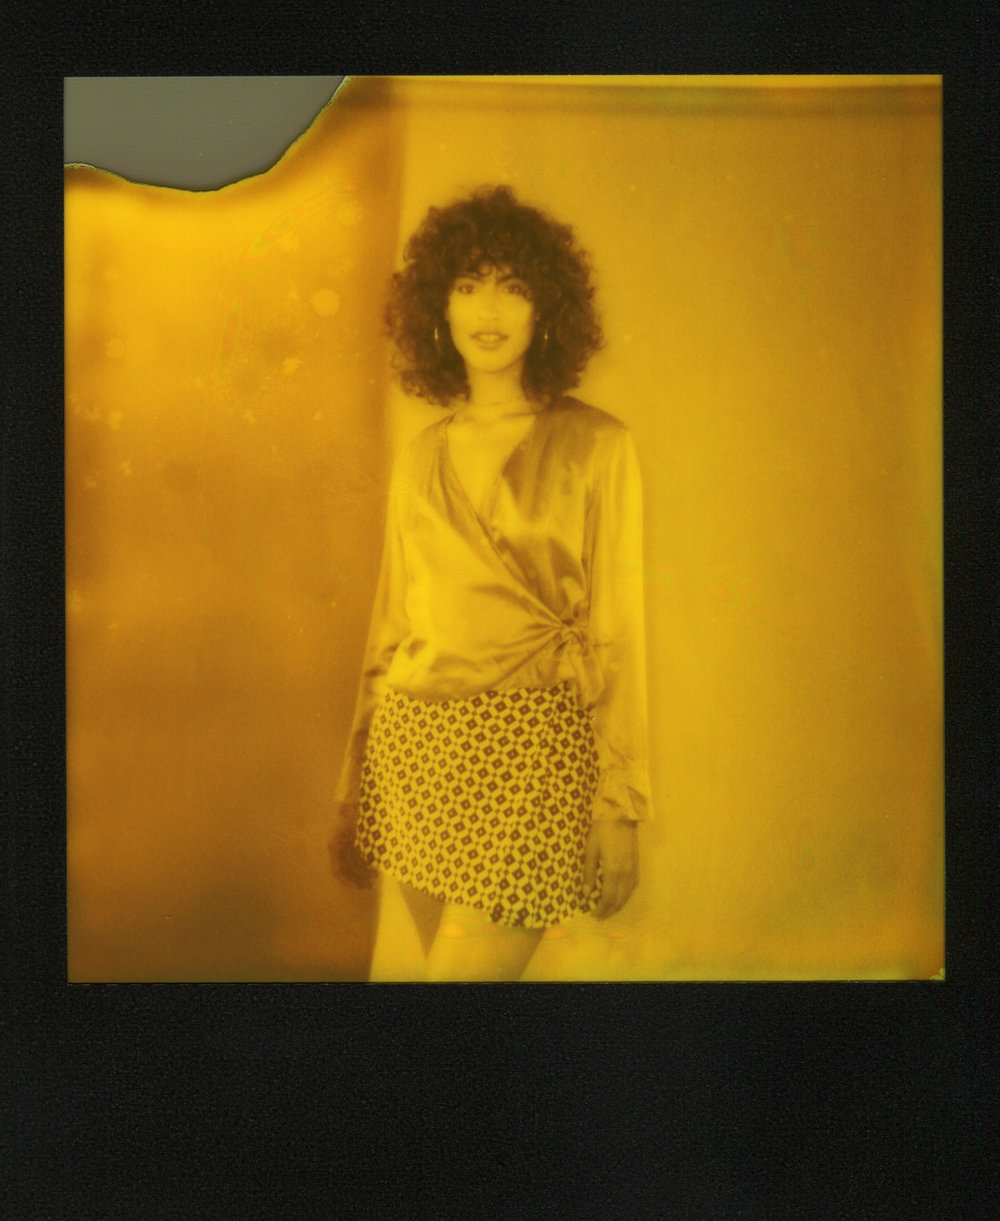 Brianna-Yellow-Polaroid-casenruiz.jpg